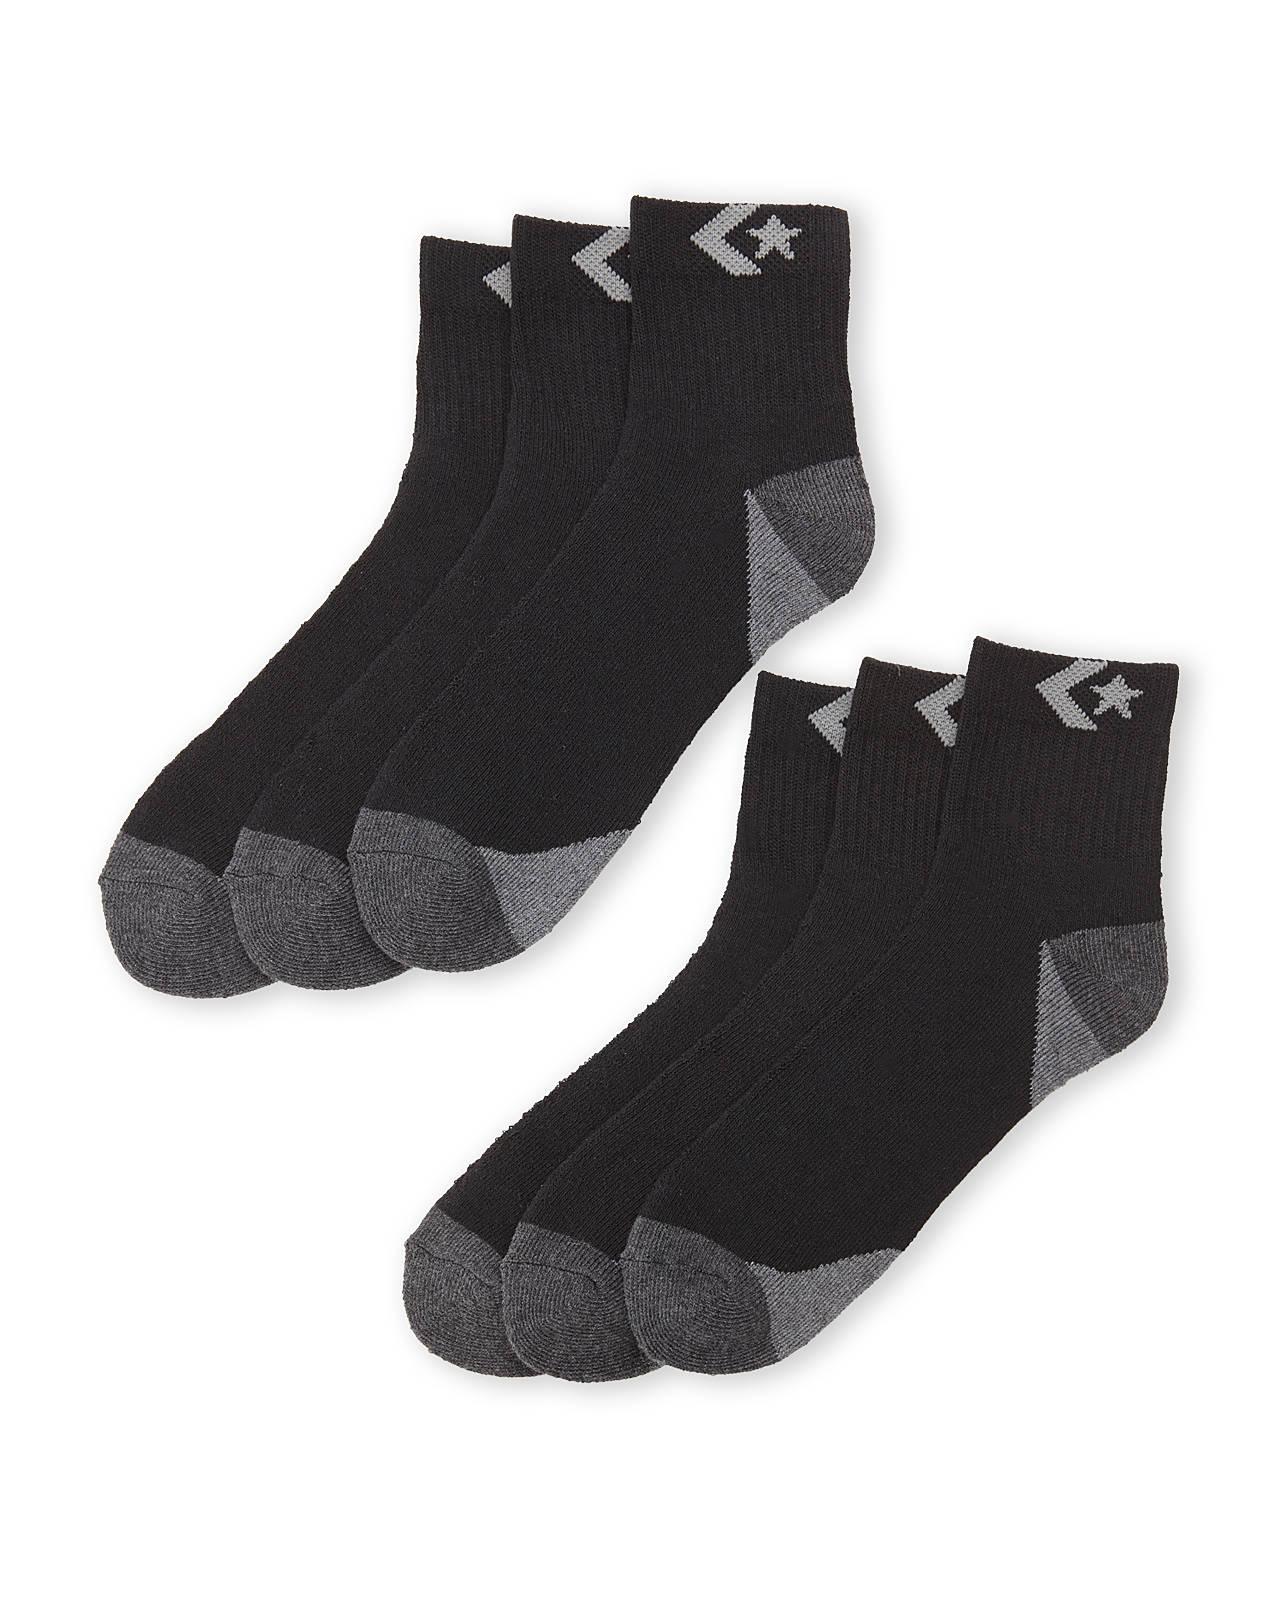 2converse socks man